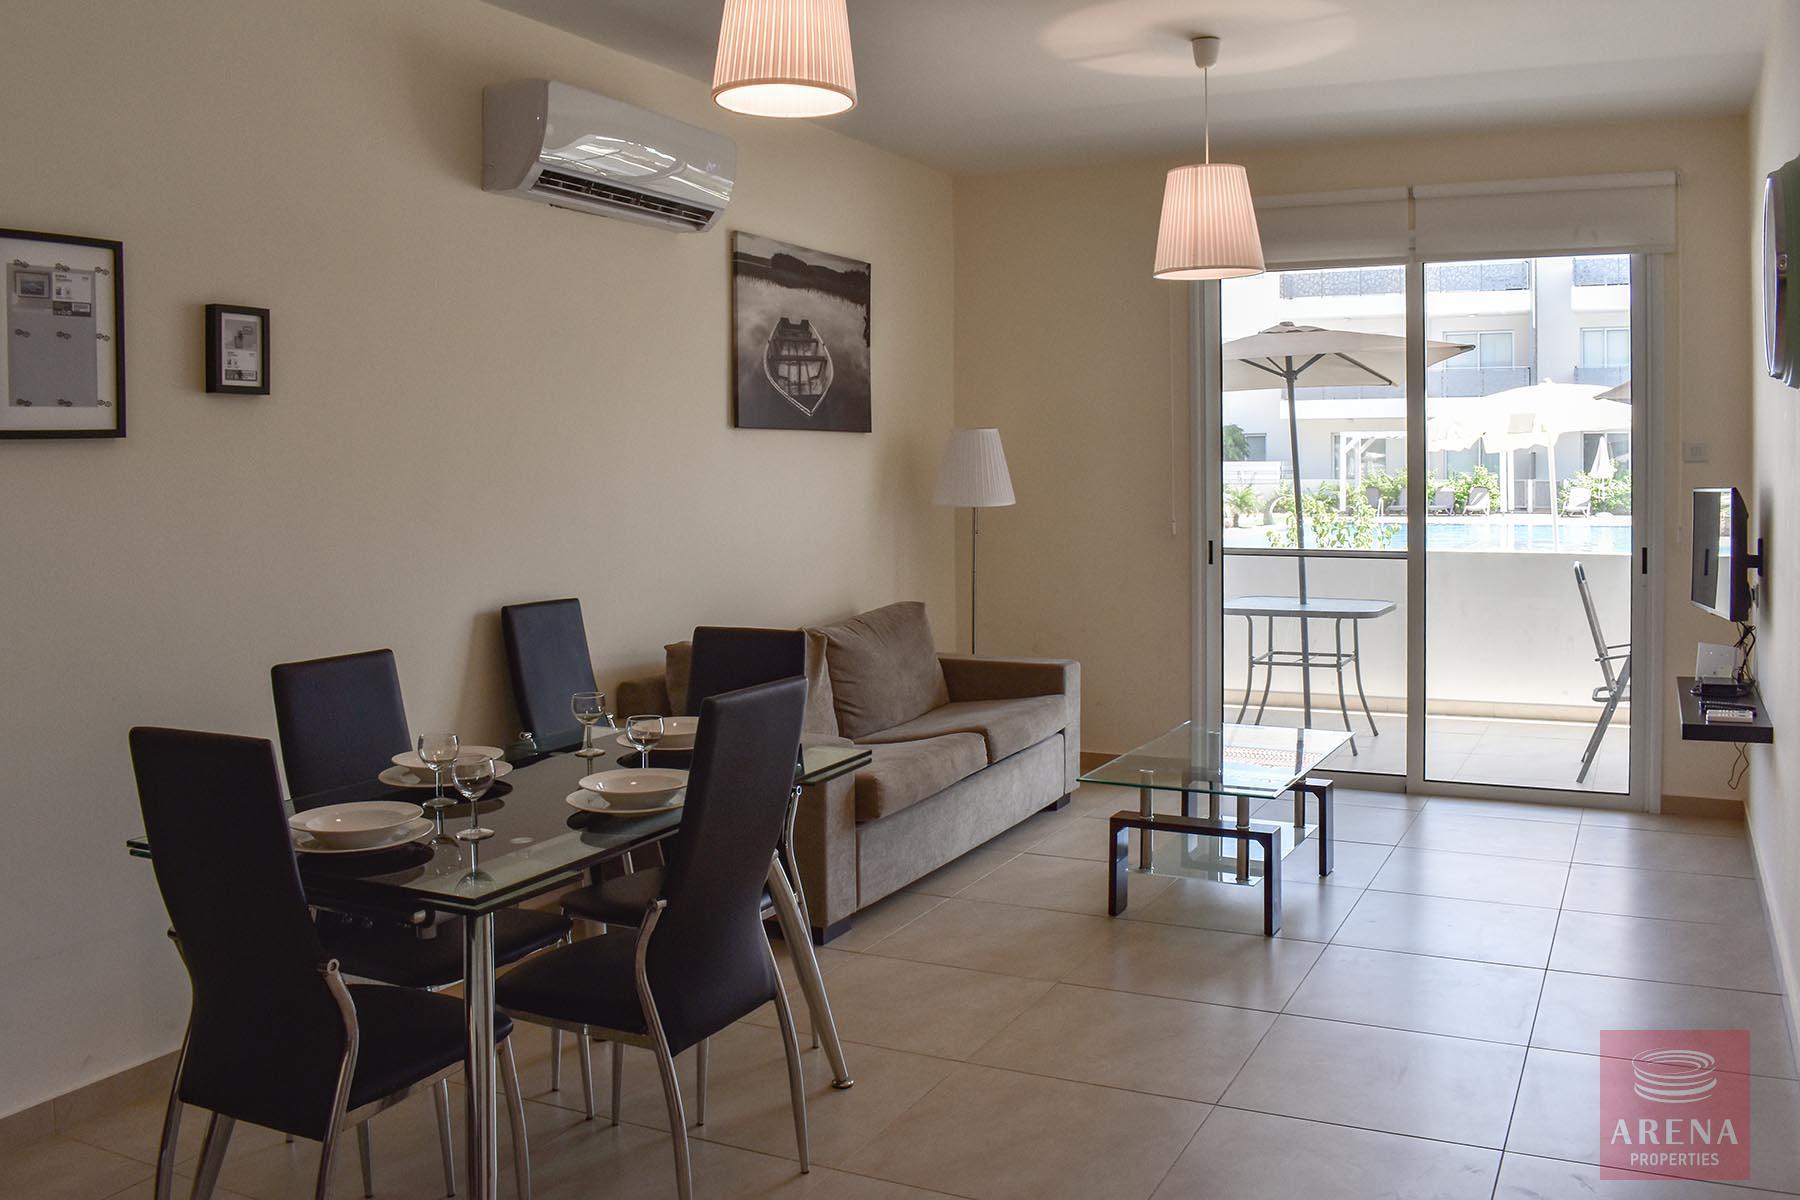 Ground Floor Apartment in Kapparis for sale - living area